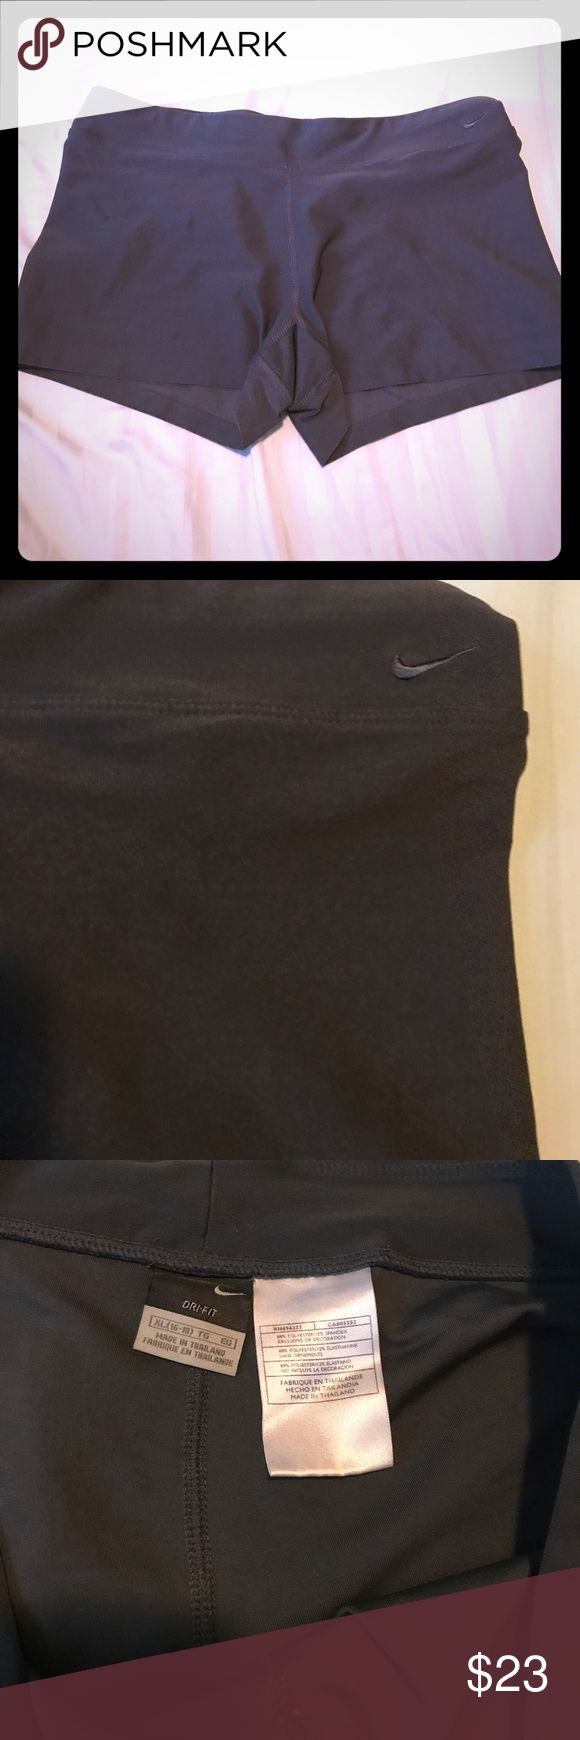 Dri-Fit Nike shorts Gray Nike dri-fit shorts, barely worn. Like new! Nike Shorts